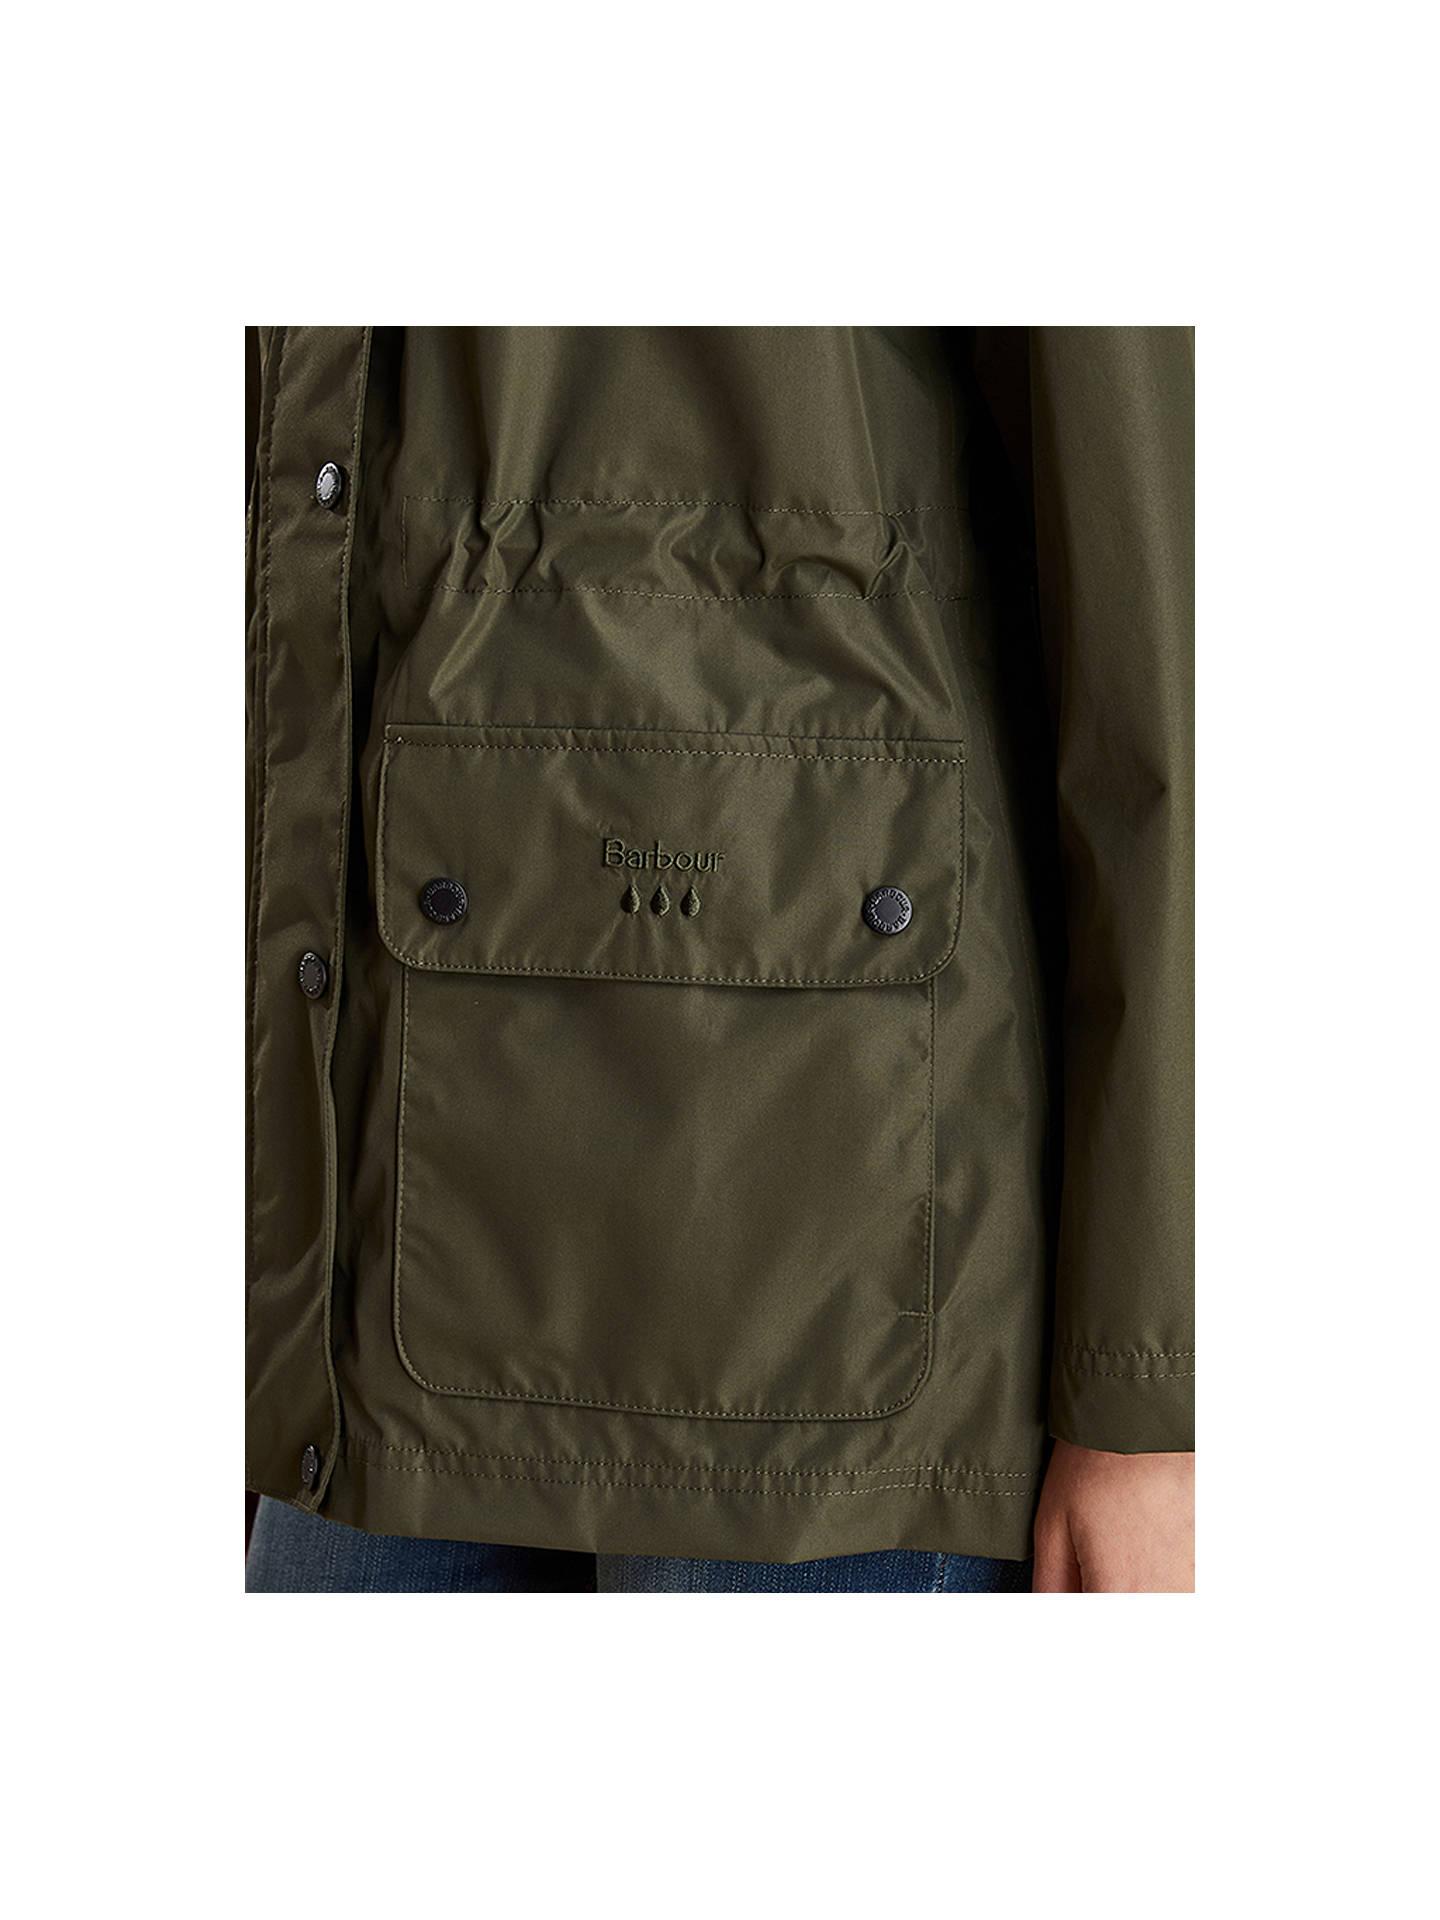 963467da563b3 ... Buy Barbour Drizzle Waterproof Jacket, Olive, 8 Online at johnlewis.com  ...